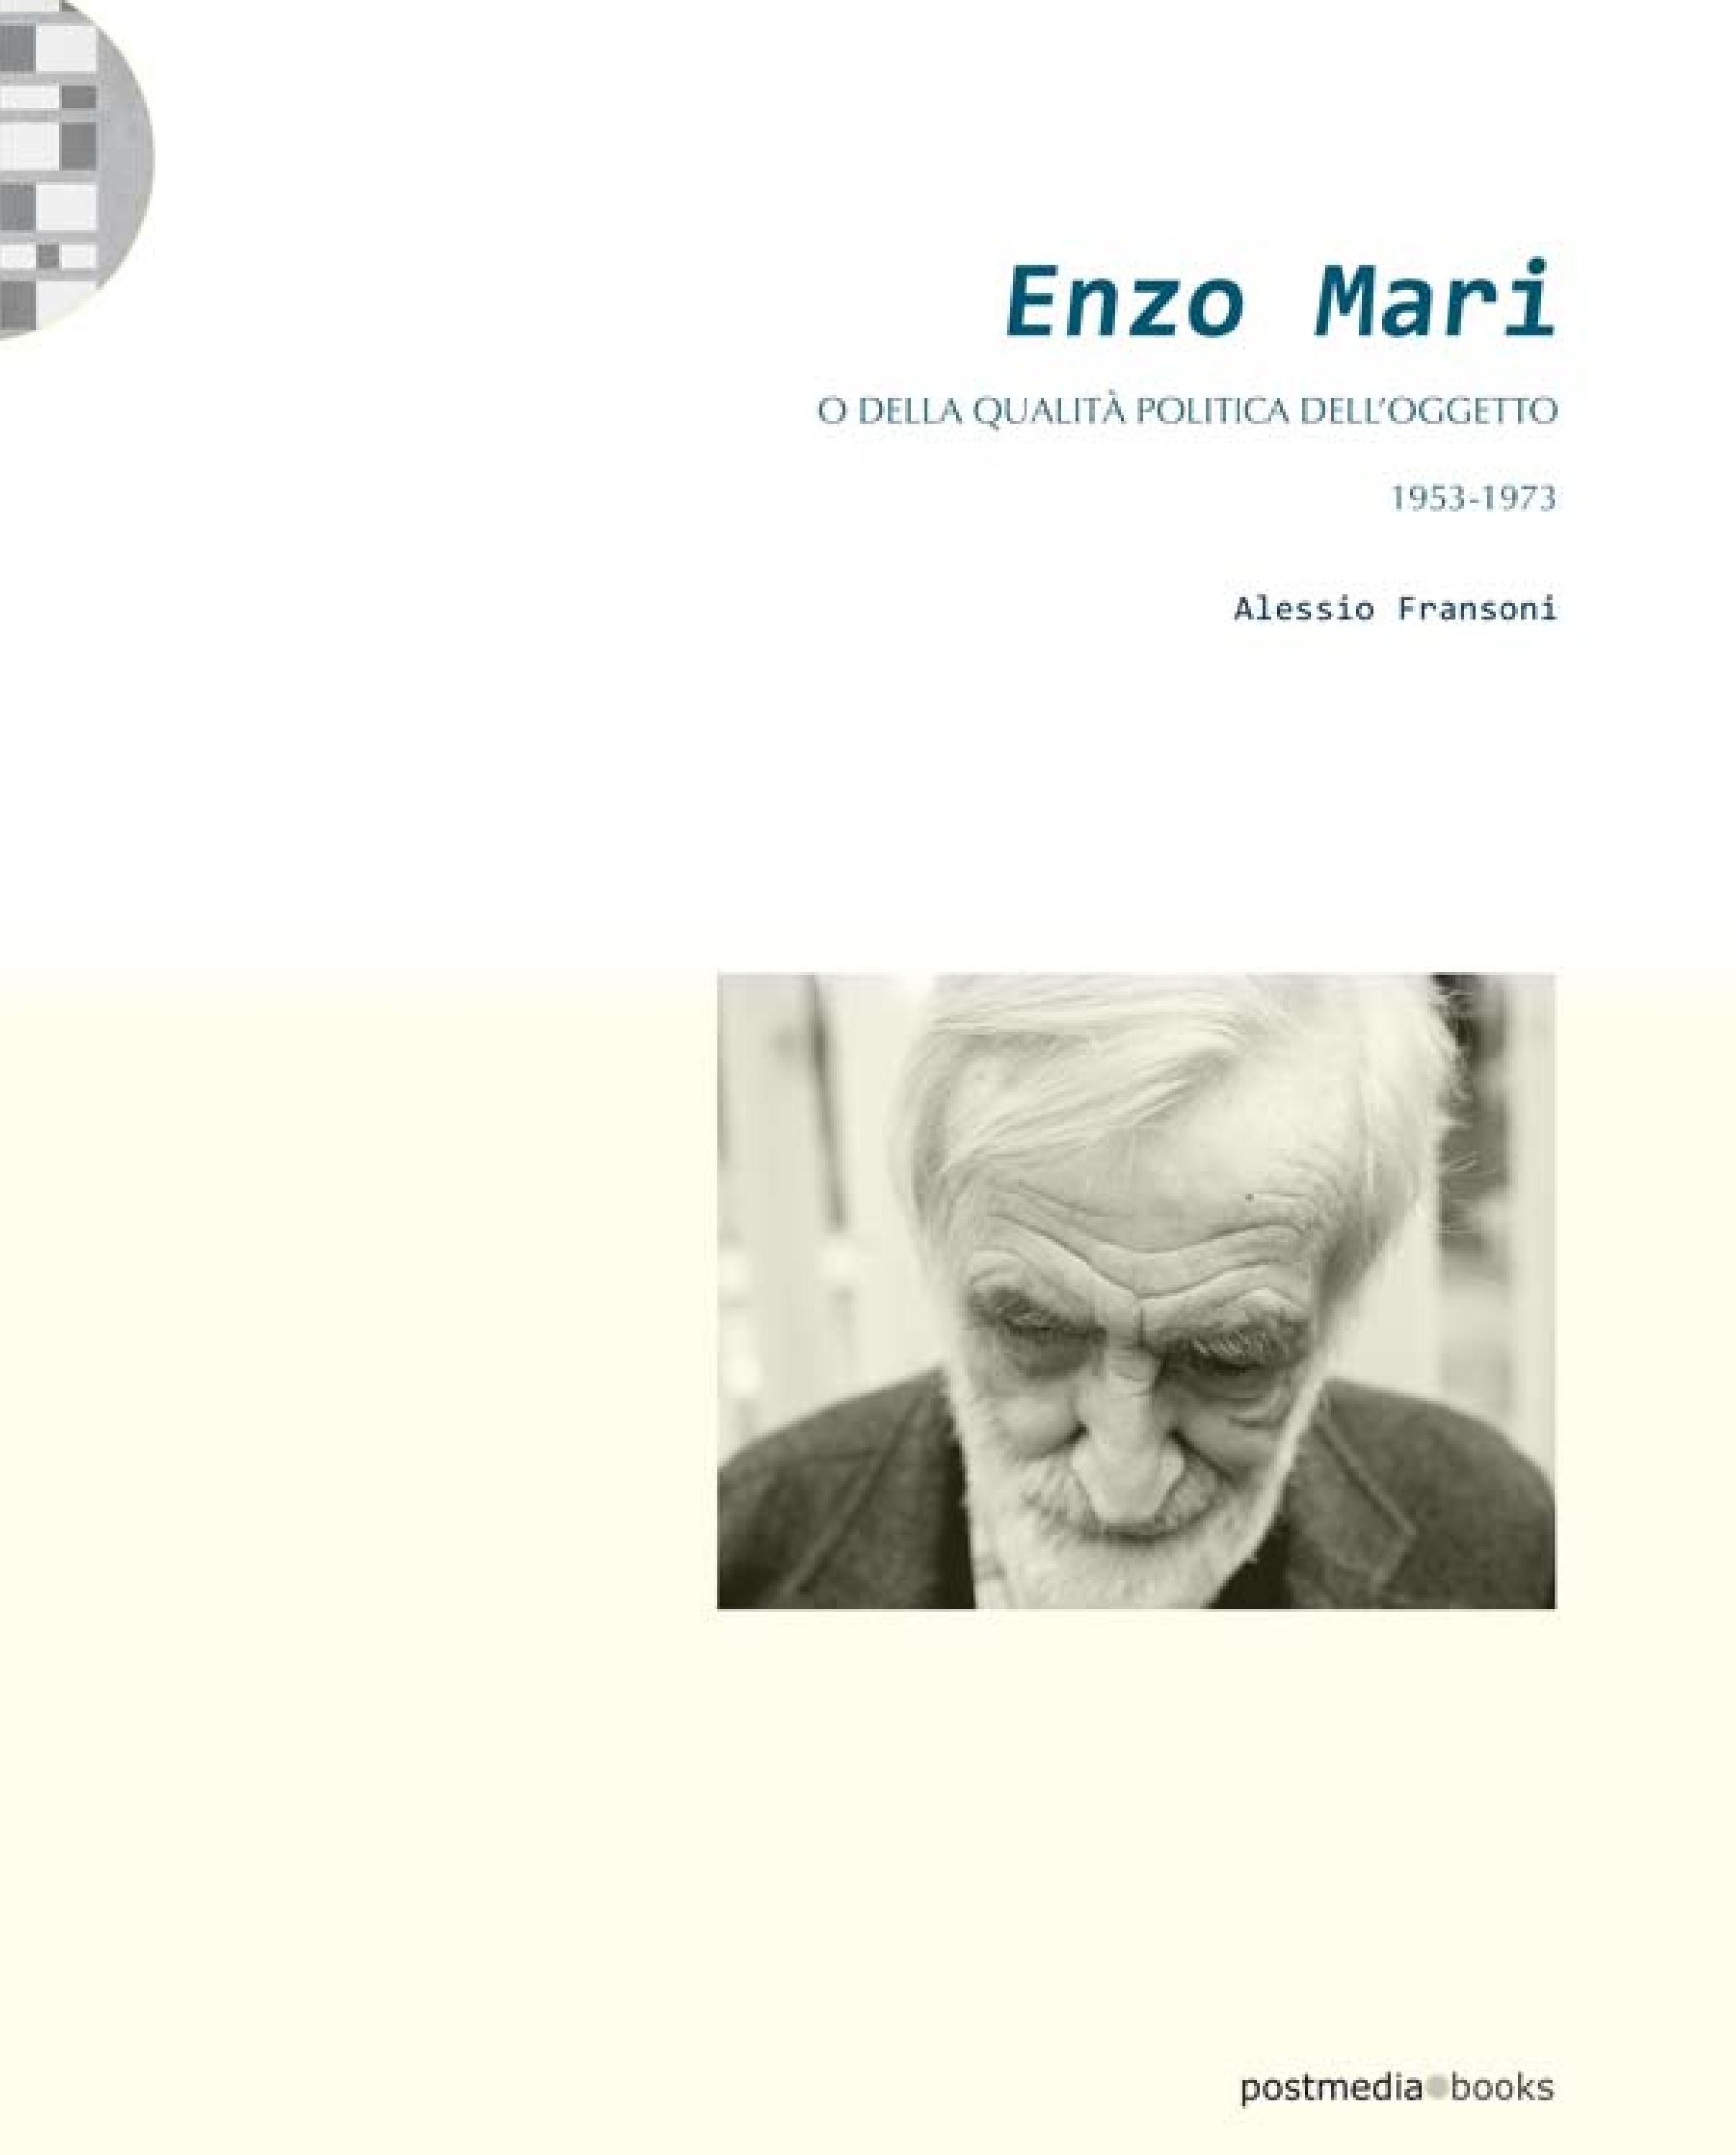 Libreria Trieste Enzo Mari enzo mari by postmedia books - issuu